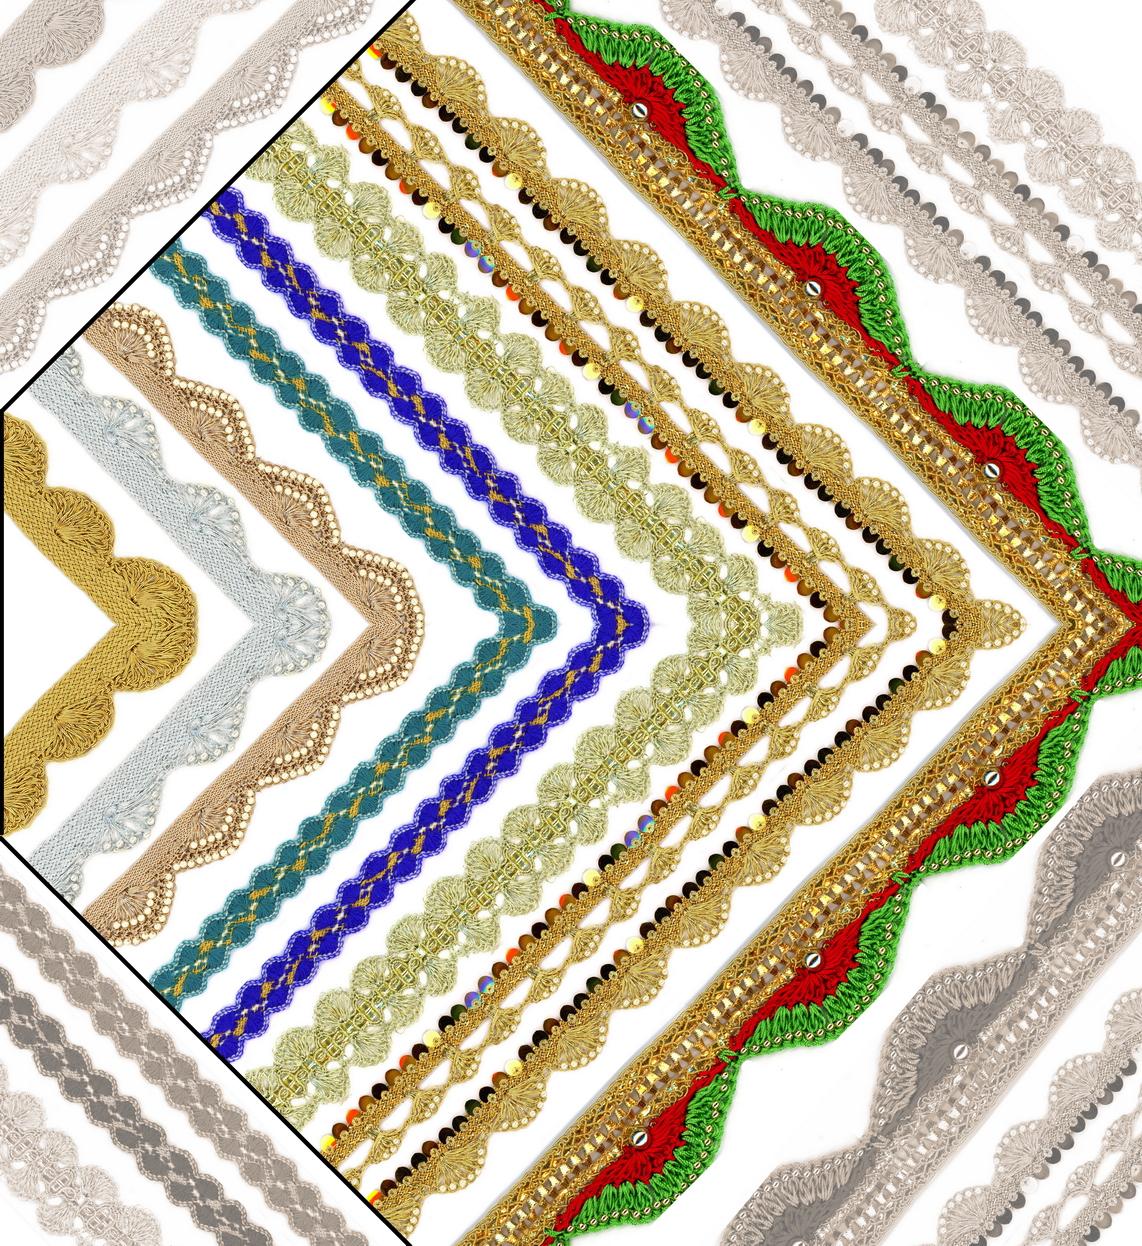 Pankha Laces - Romy Lace - Best Lace Manufacturer in Surat, India